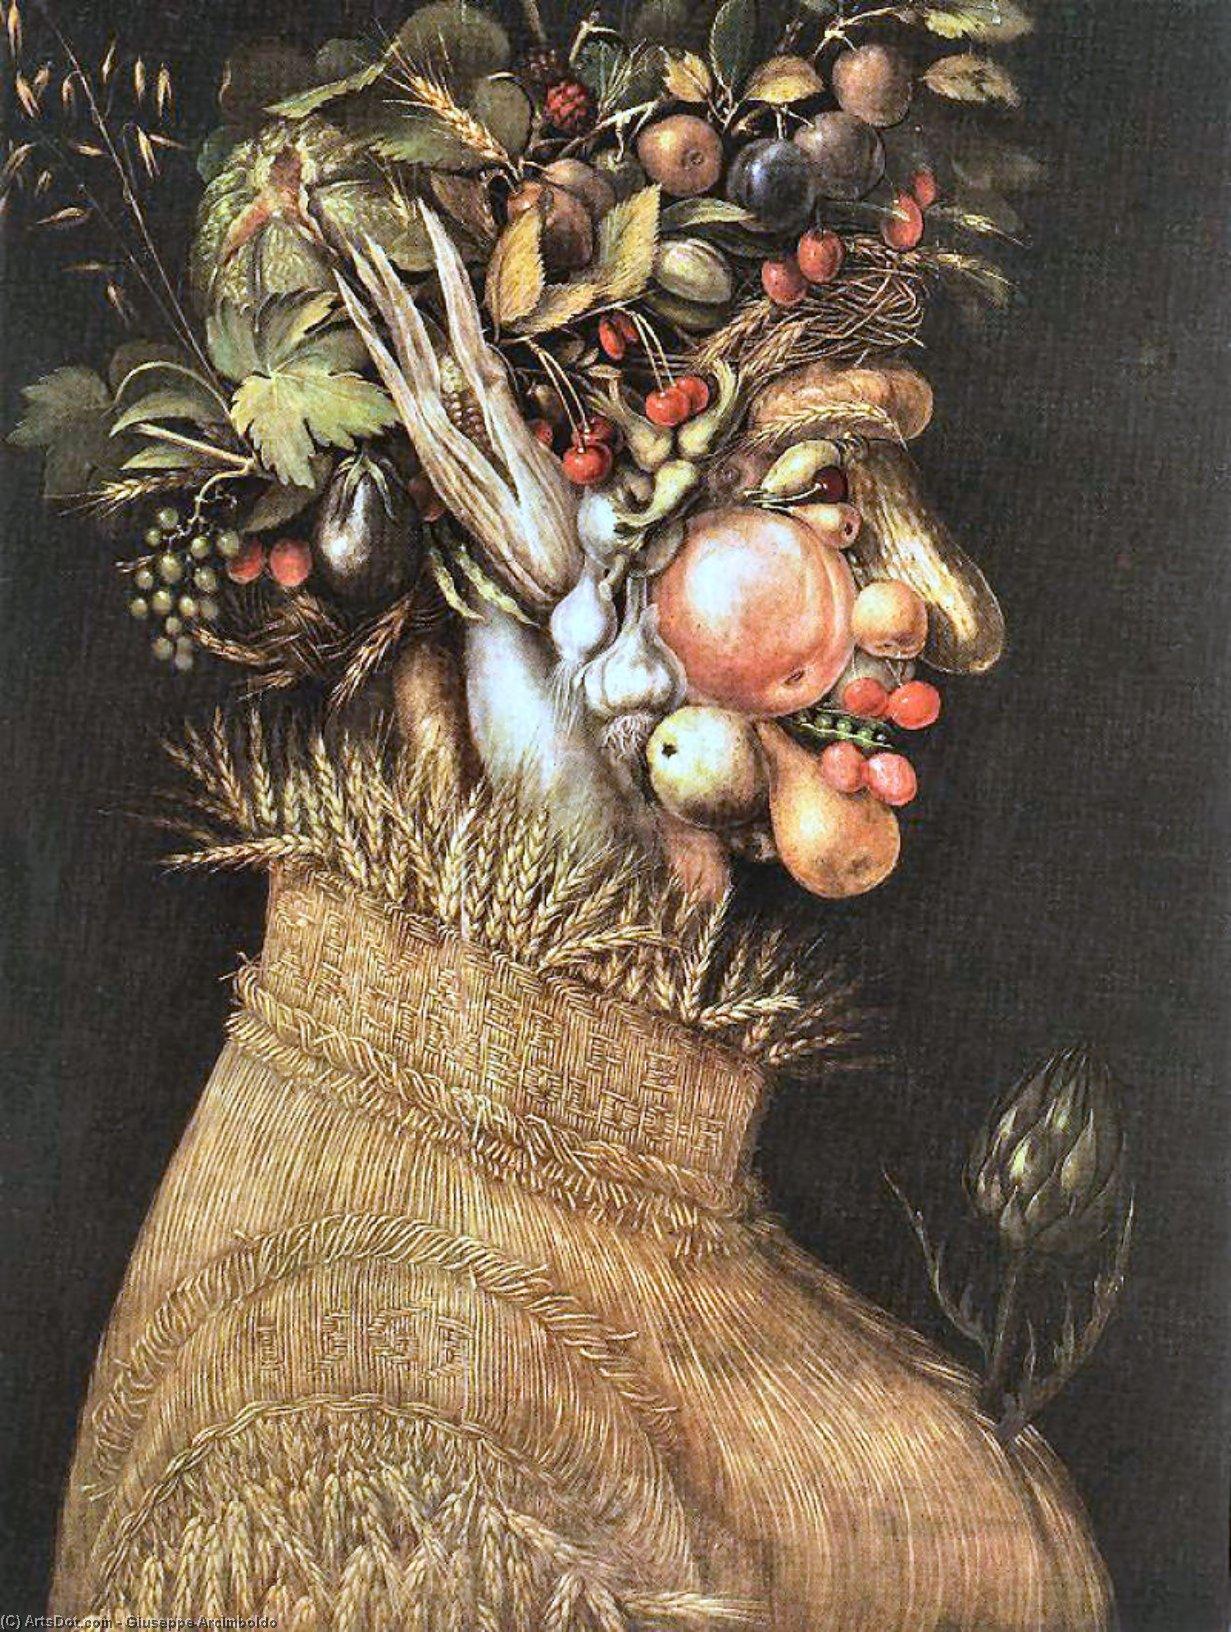 Wikioo.org - The Encyclopedia of Fine Arts - Painting, Artwork by Giuseppe Arcimboldo - Summer 1